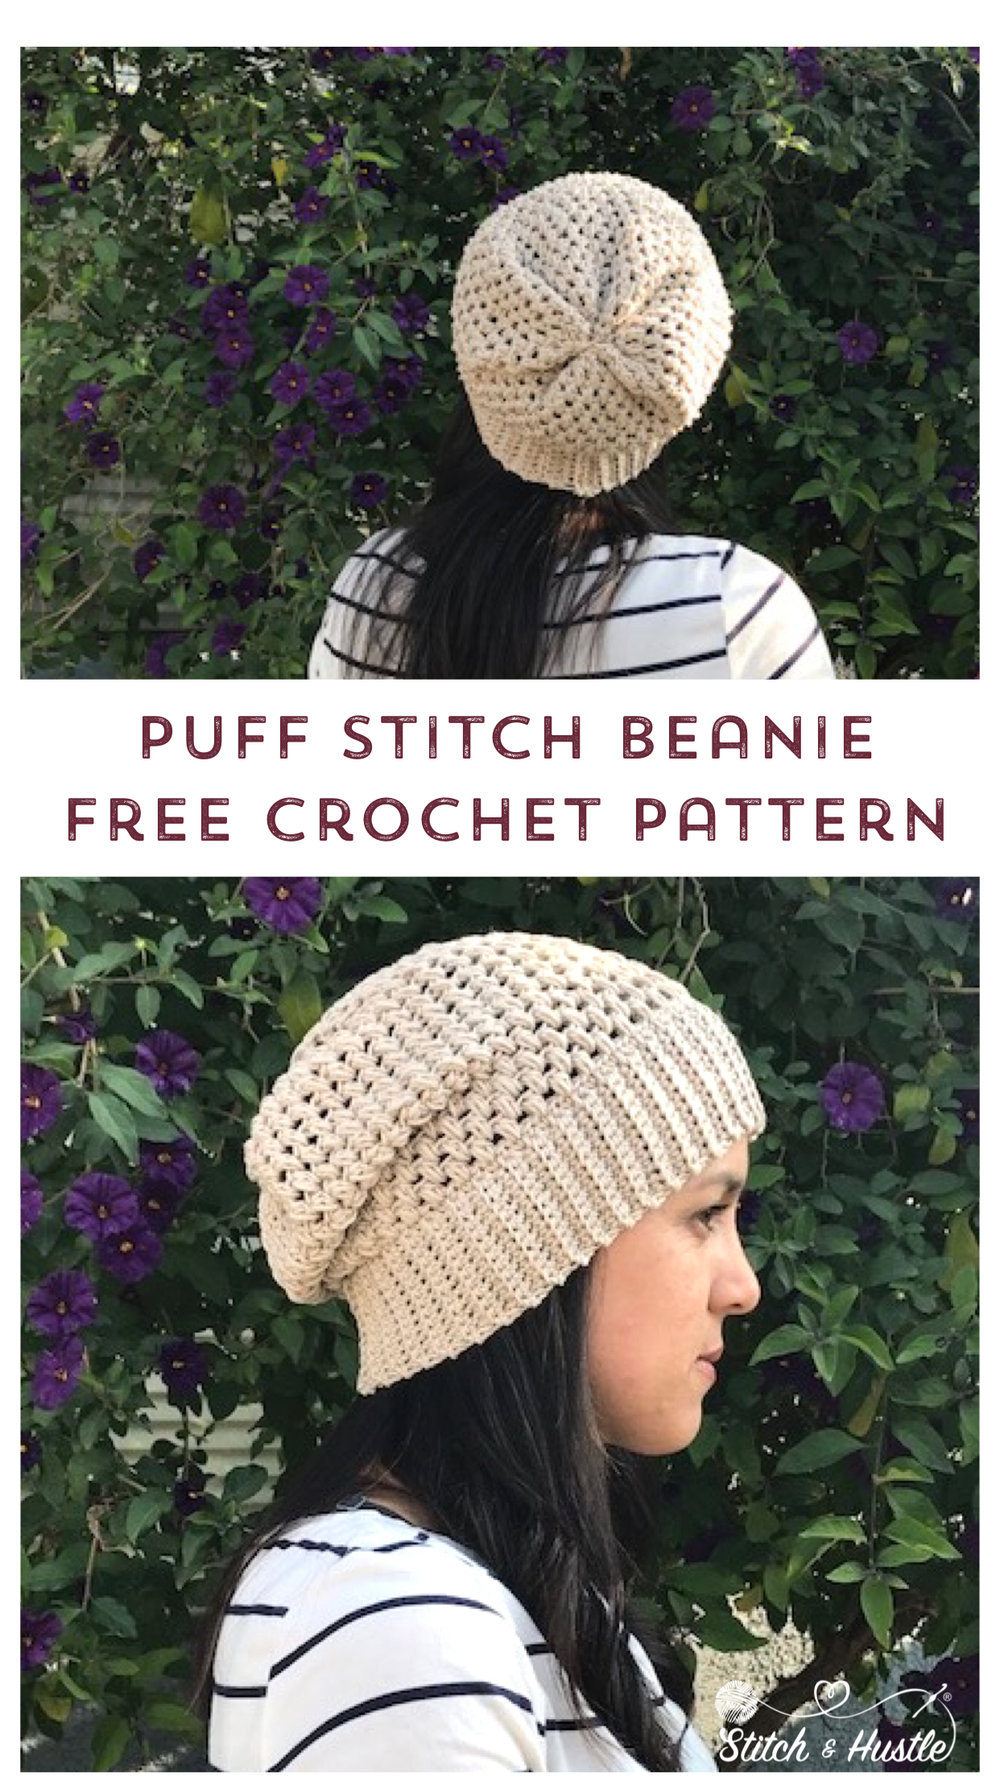 puff_stitch_slouchy_beanie_free_crochet_pattern_4.jpg